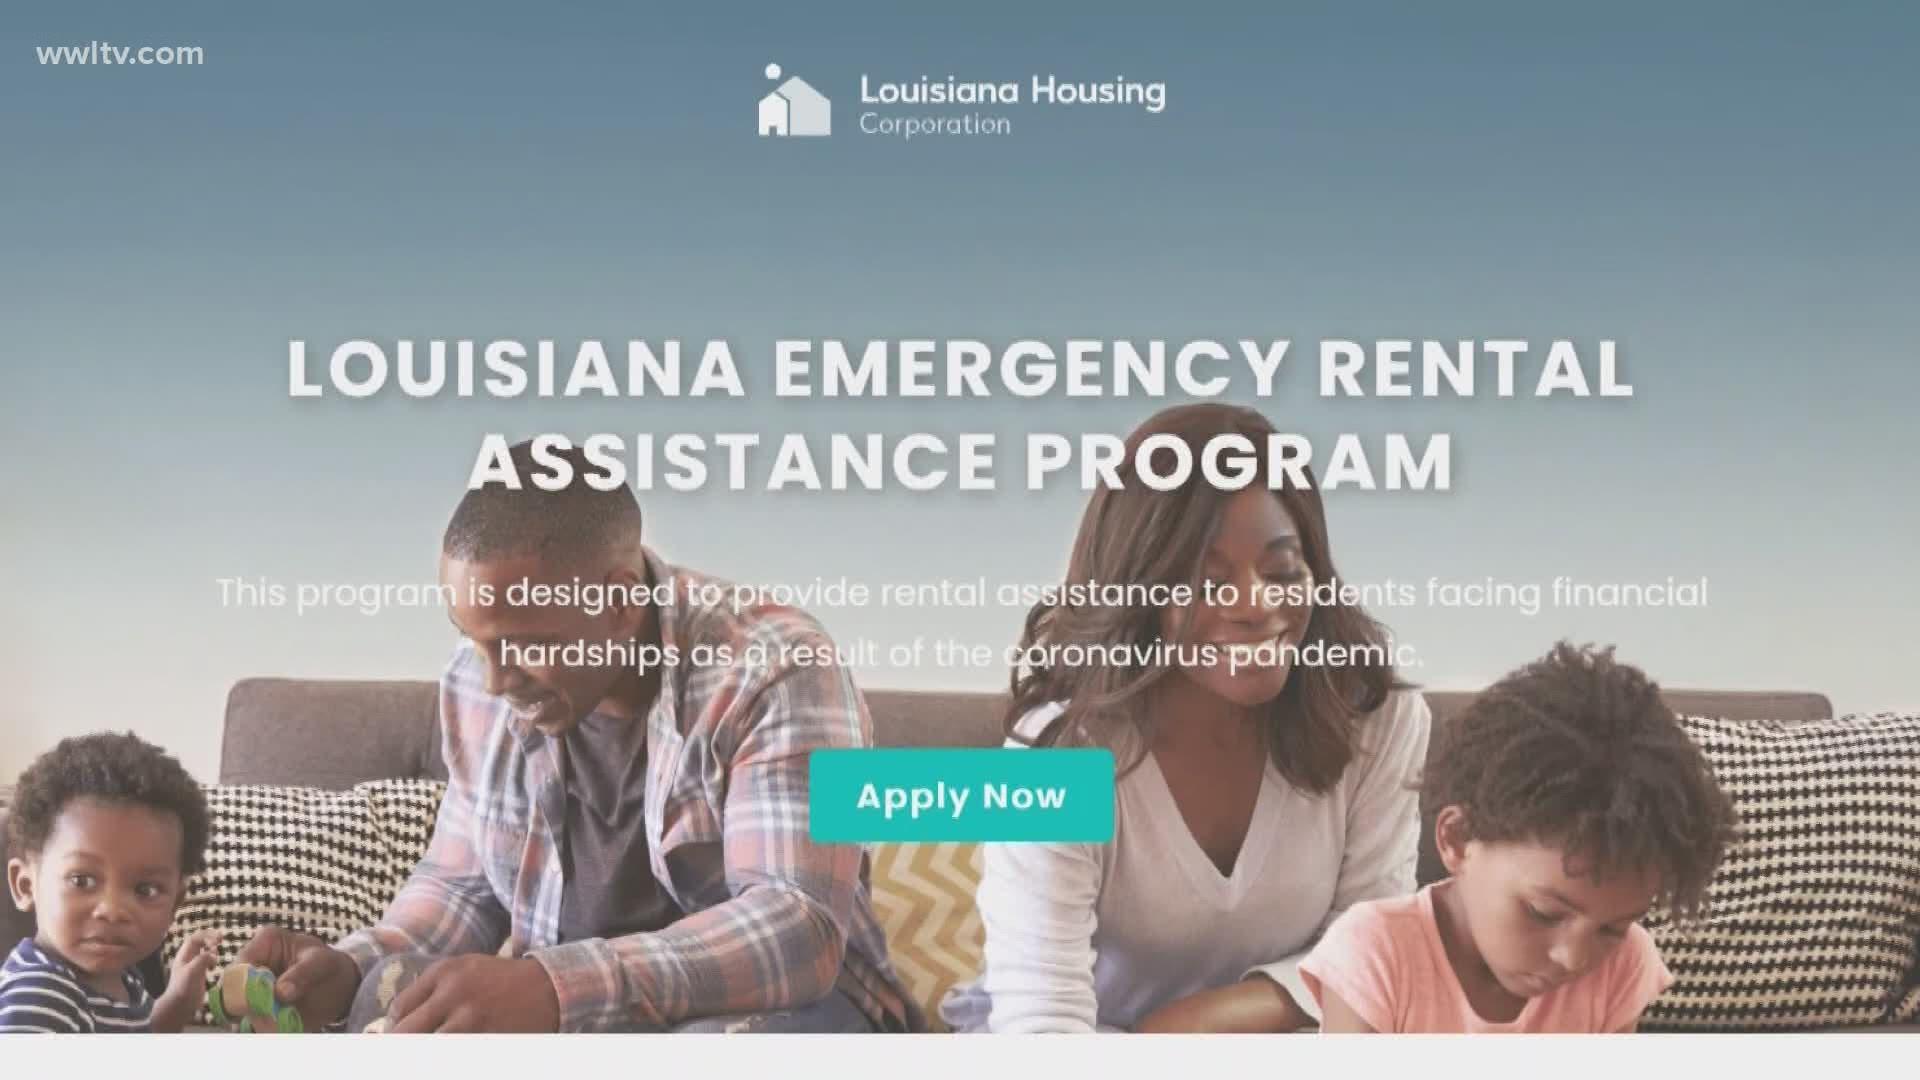 Louisiana Rental Assistance Program Taking Applications Wwltv Com